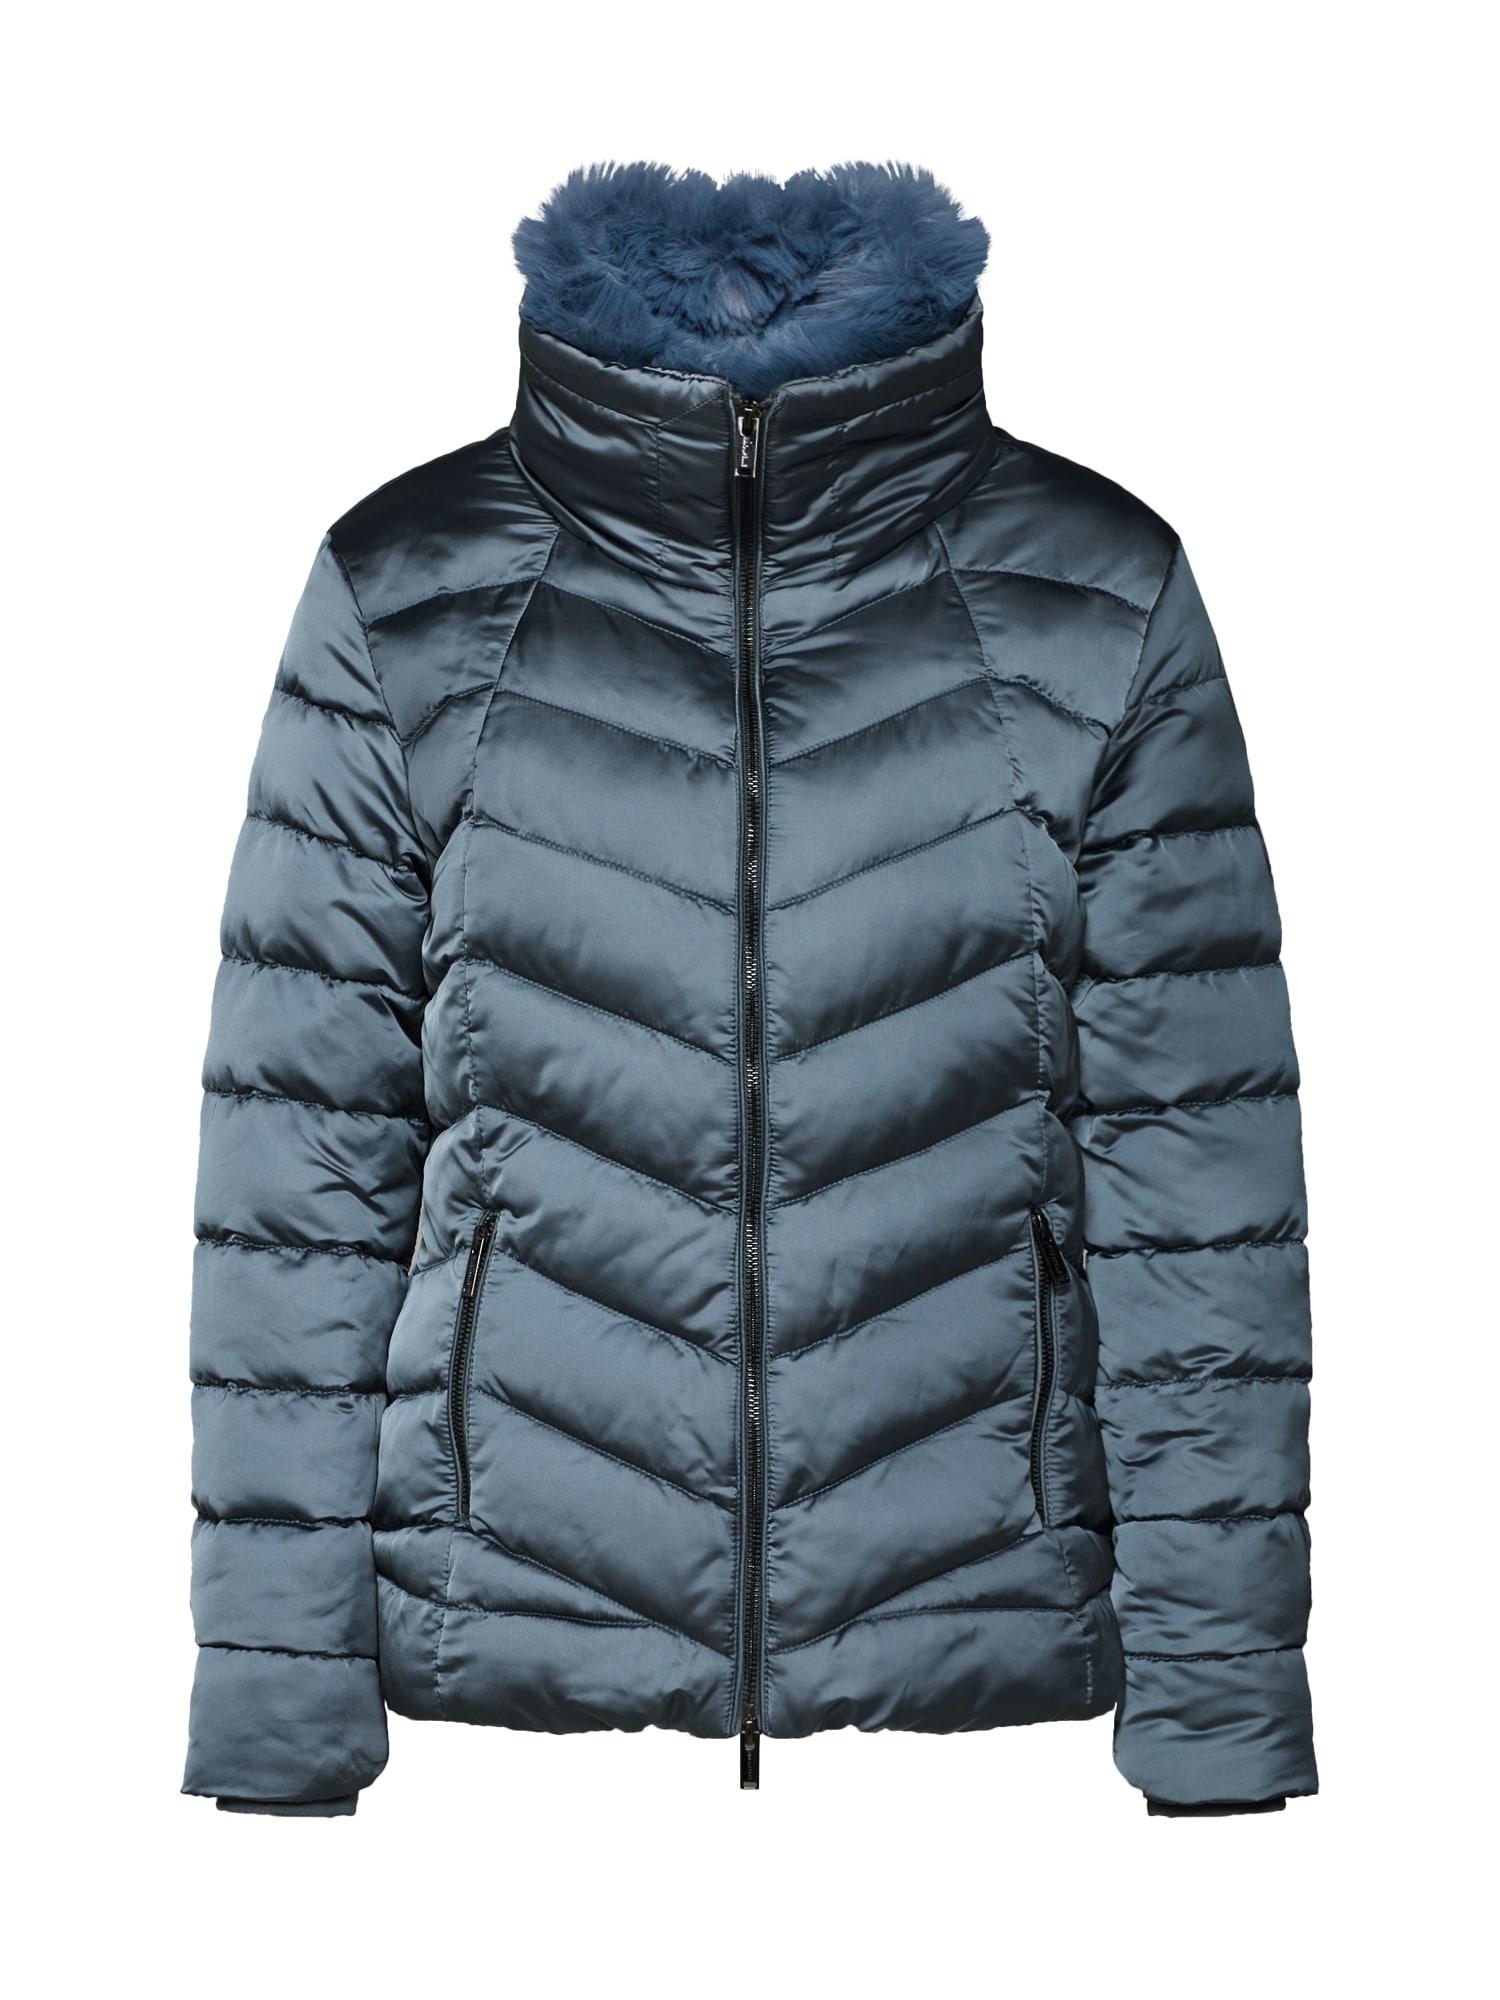 Přechodná bunda TIZ kouřově modrá RINO & PELLE